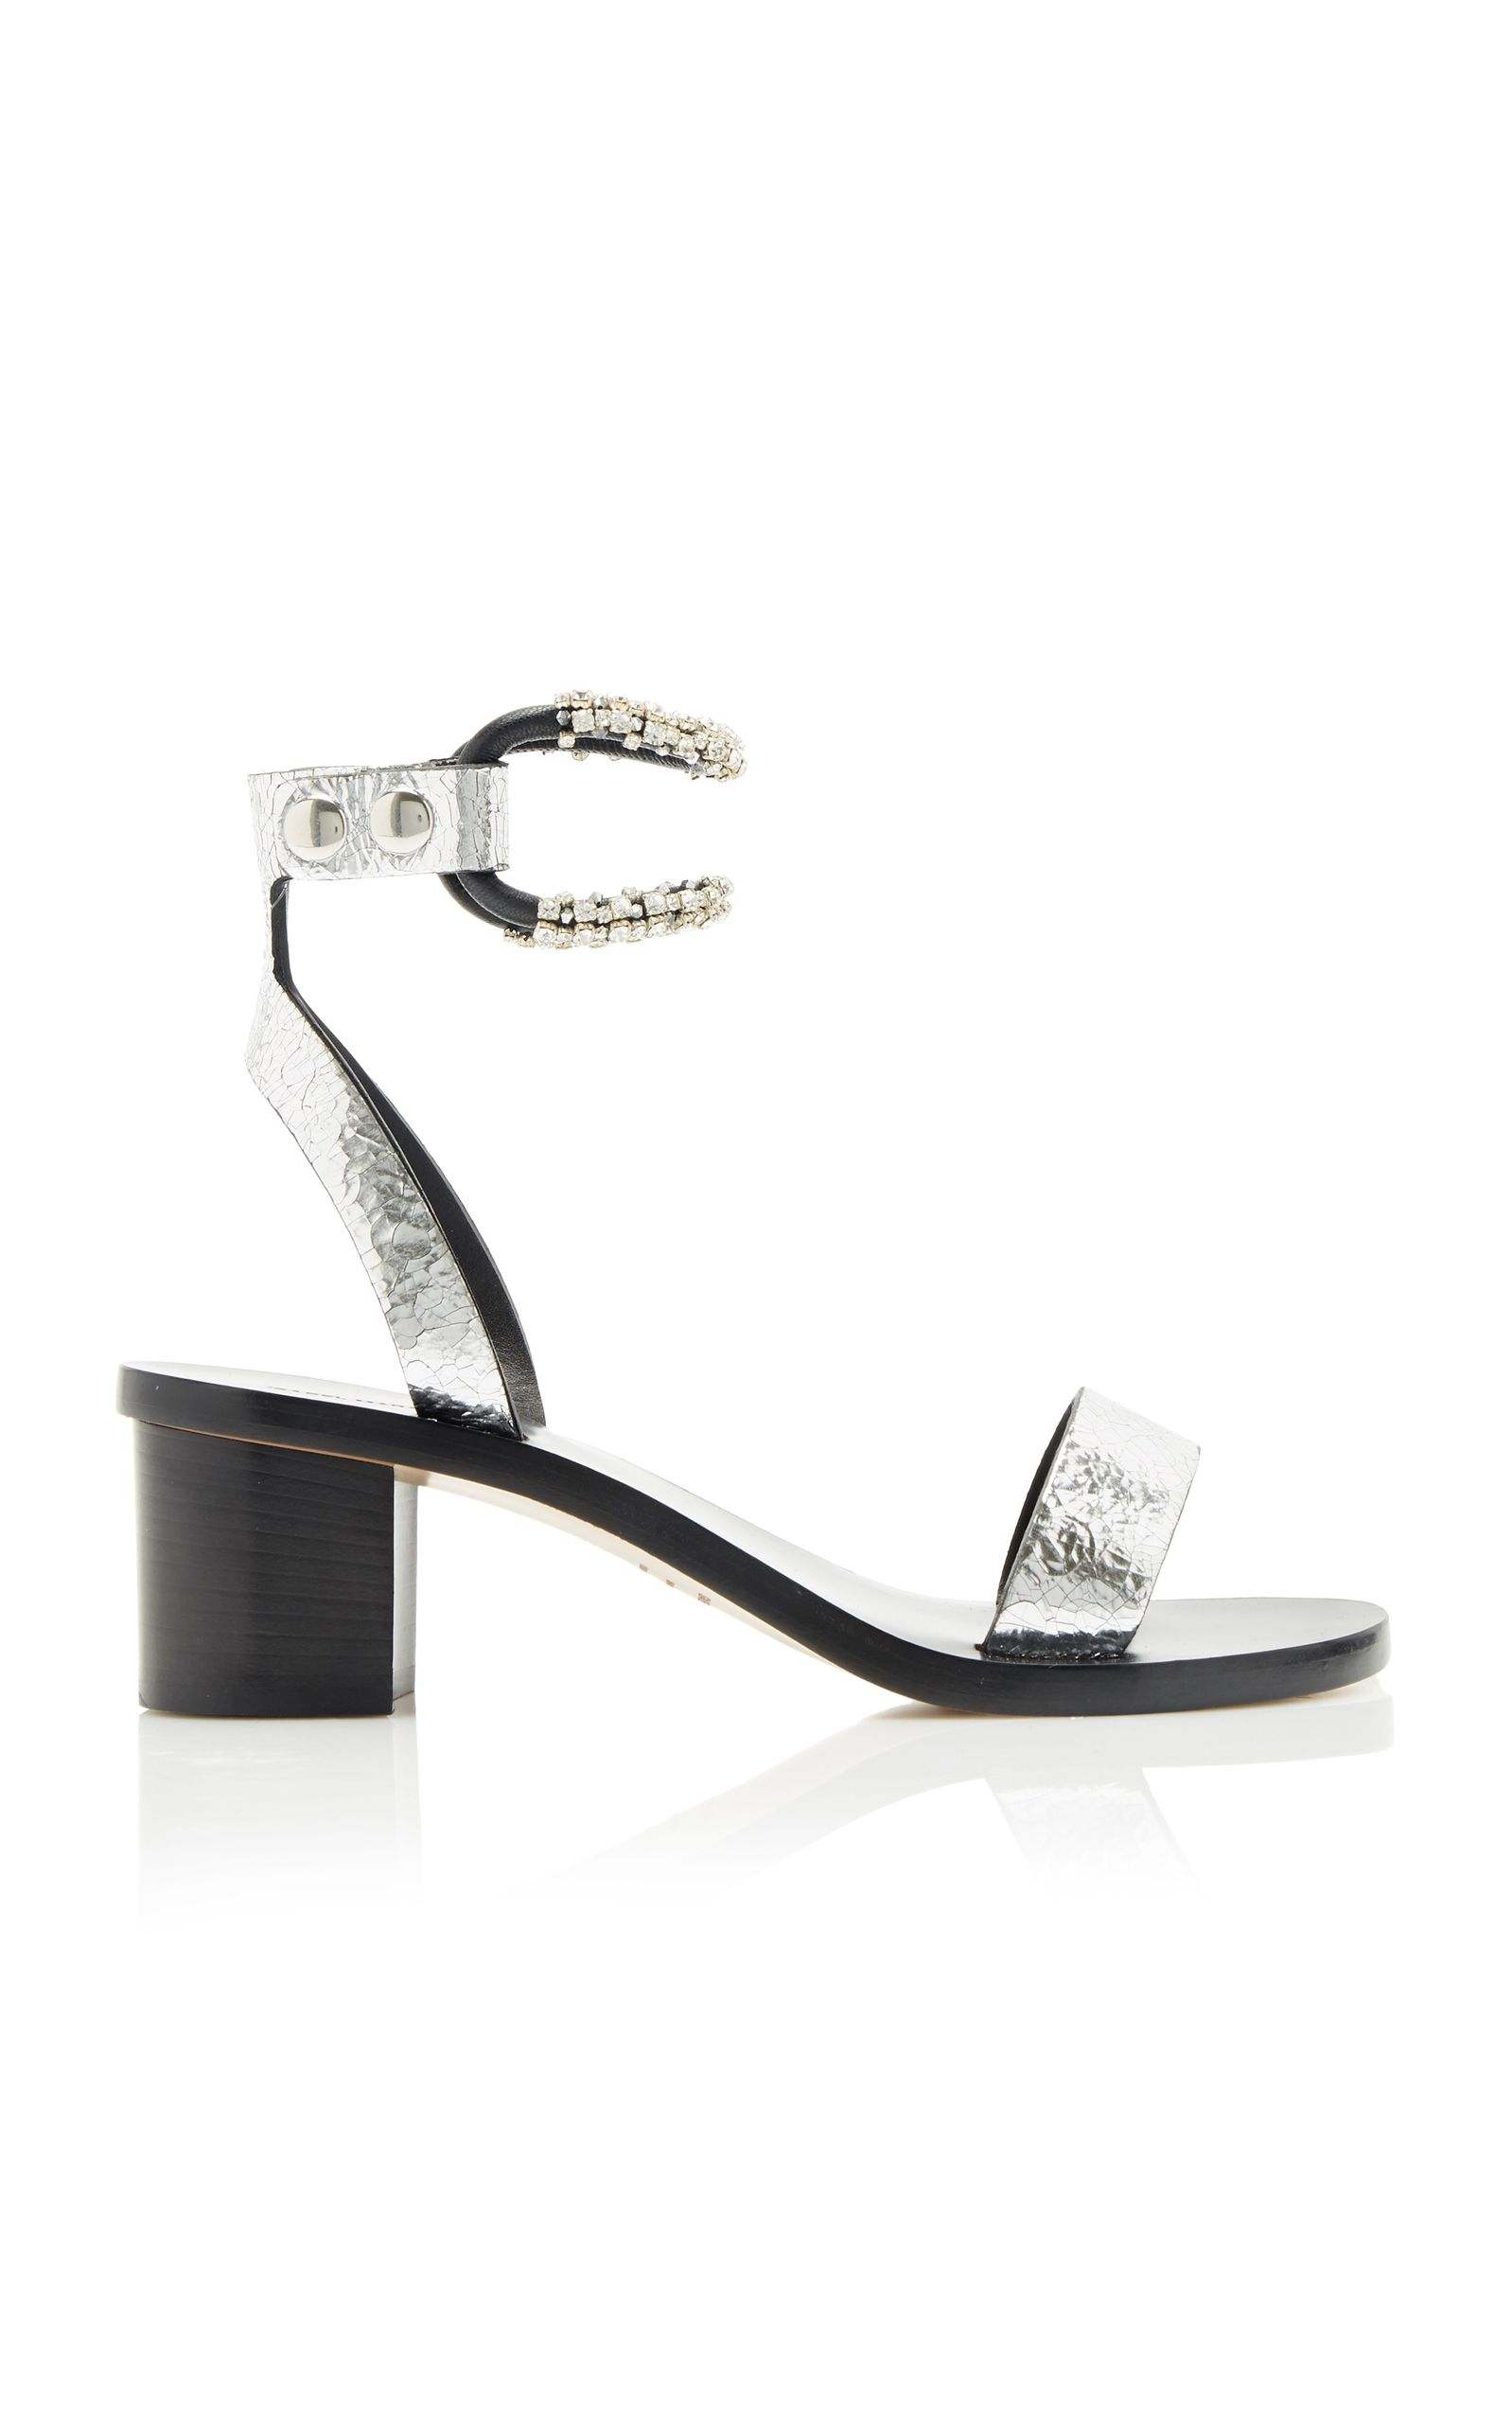 Ecly Jeweled SandalIsabel Marant J6BtT9v6